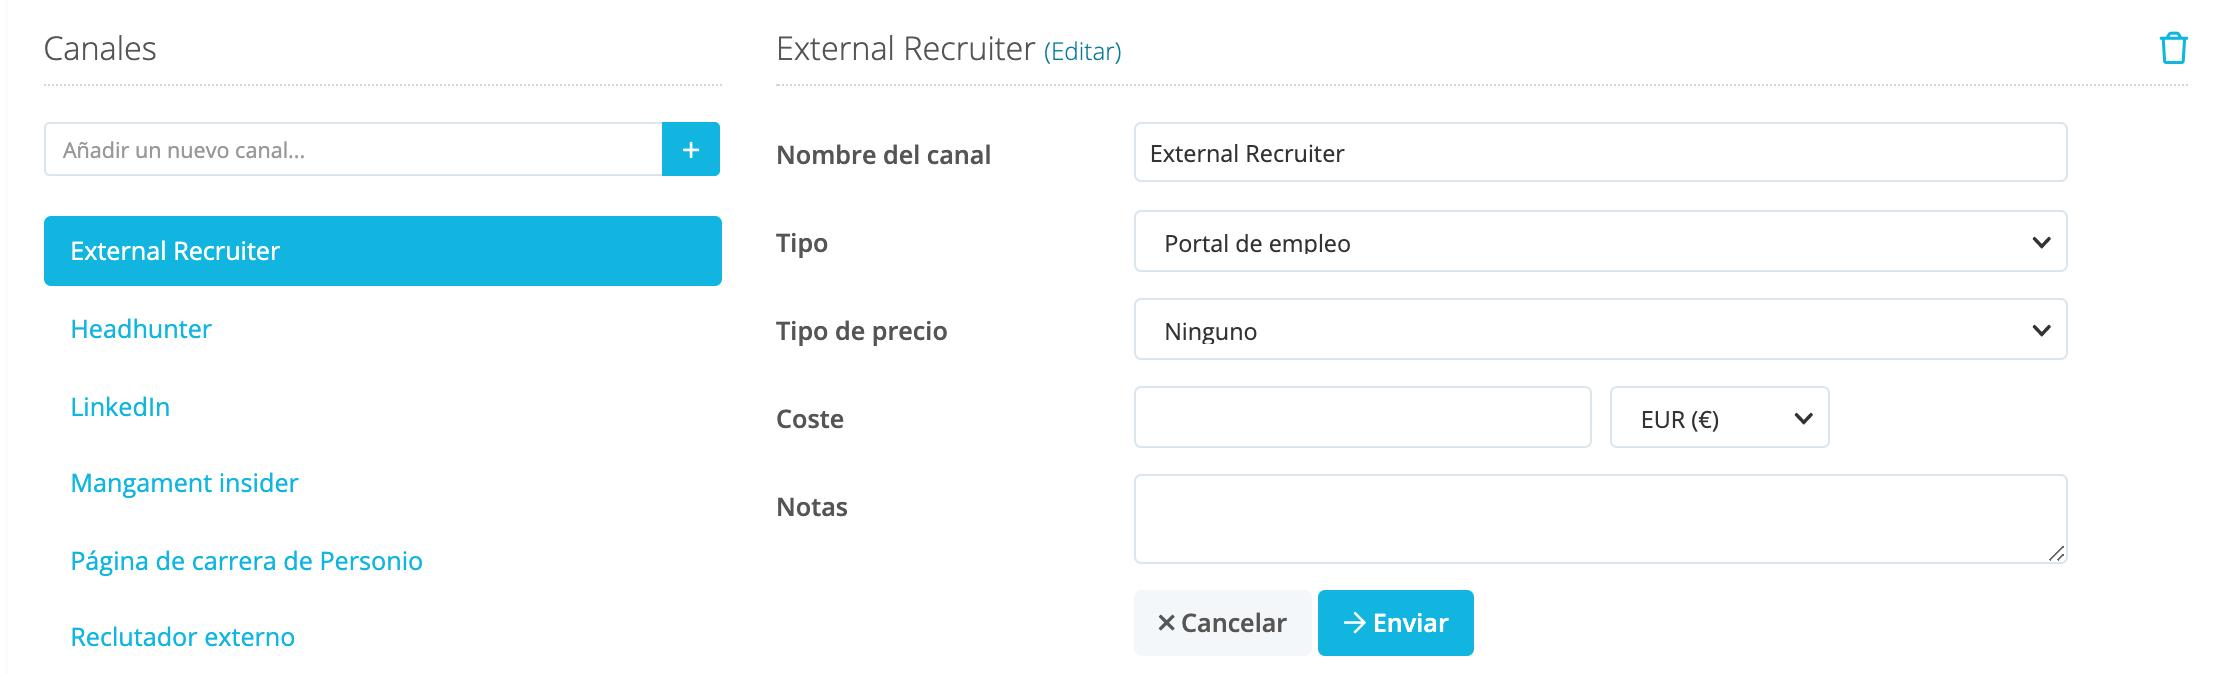 Recruiter-OptionA-Channel_es.png